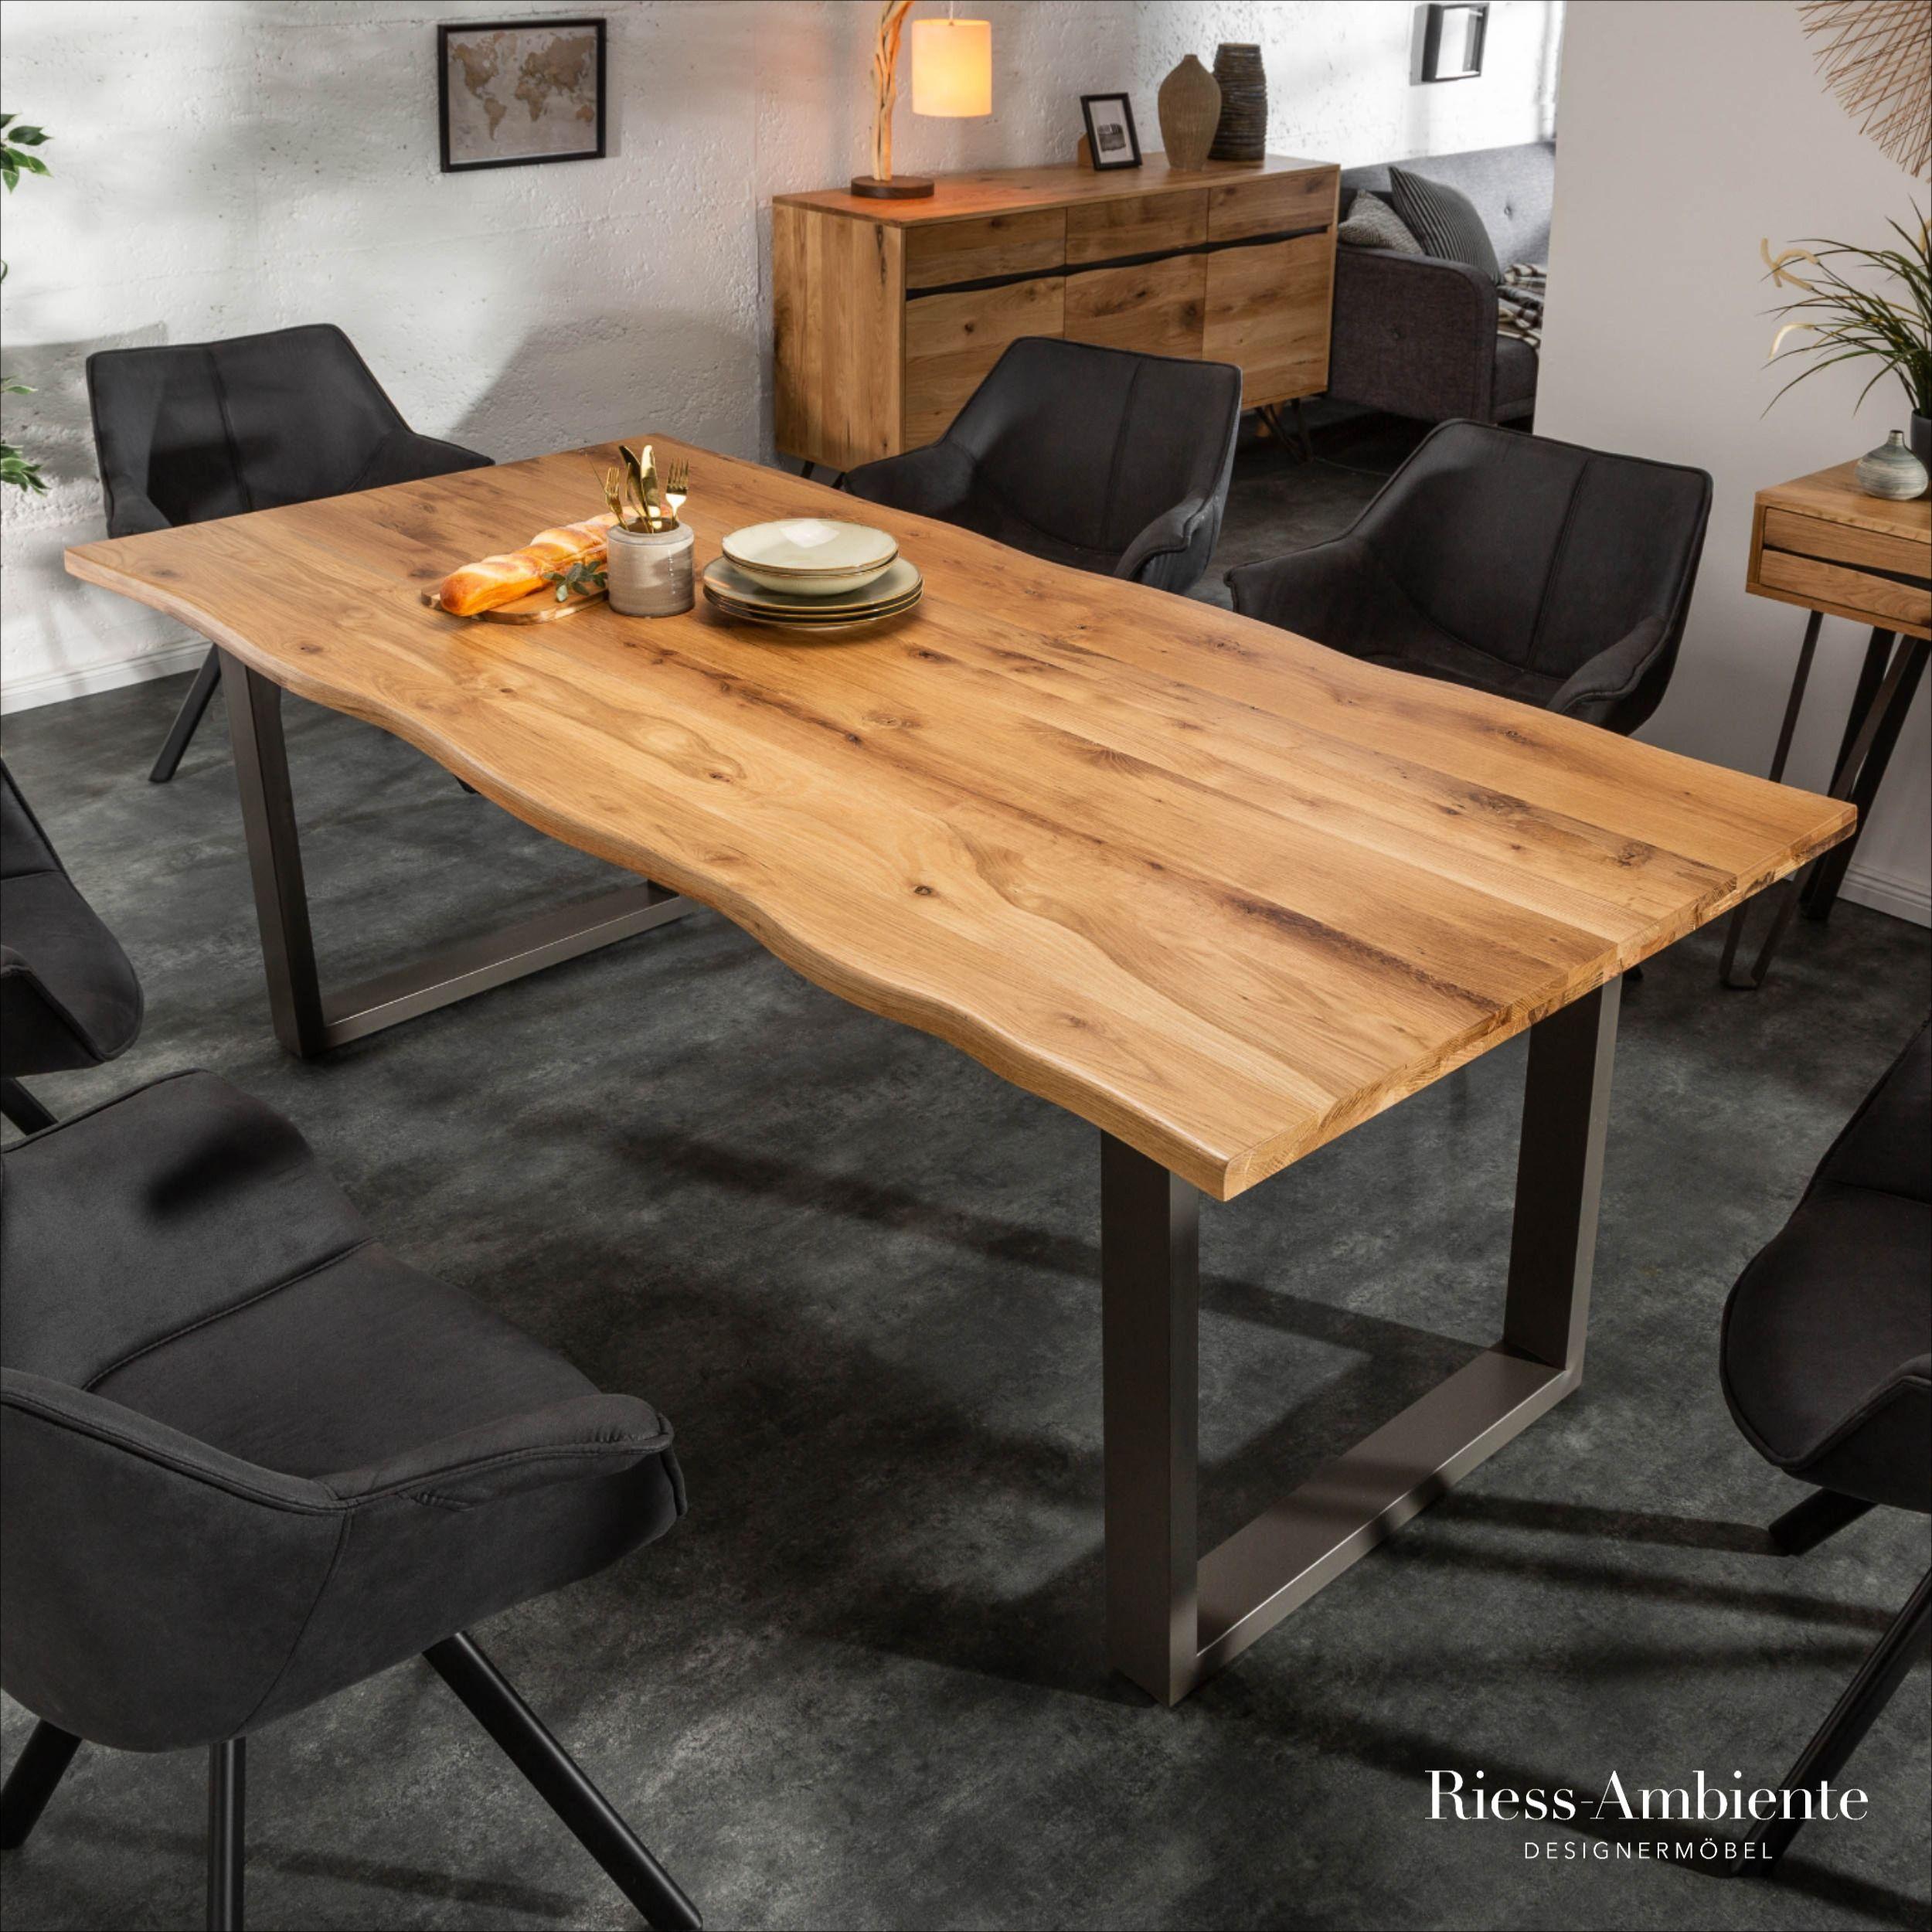 Massiver Baumkanten Esstisch Living Edge 180cm Wildeiche Geolt 3 5cm Tischplatte Riess Ambiente De In 2020 Wohnung Esszimmer Wohnung Mobel Wohn Esszimmer